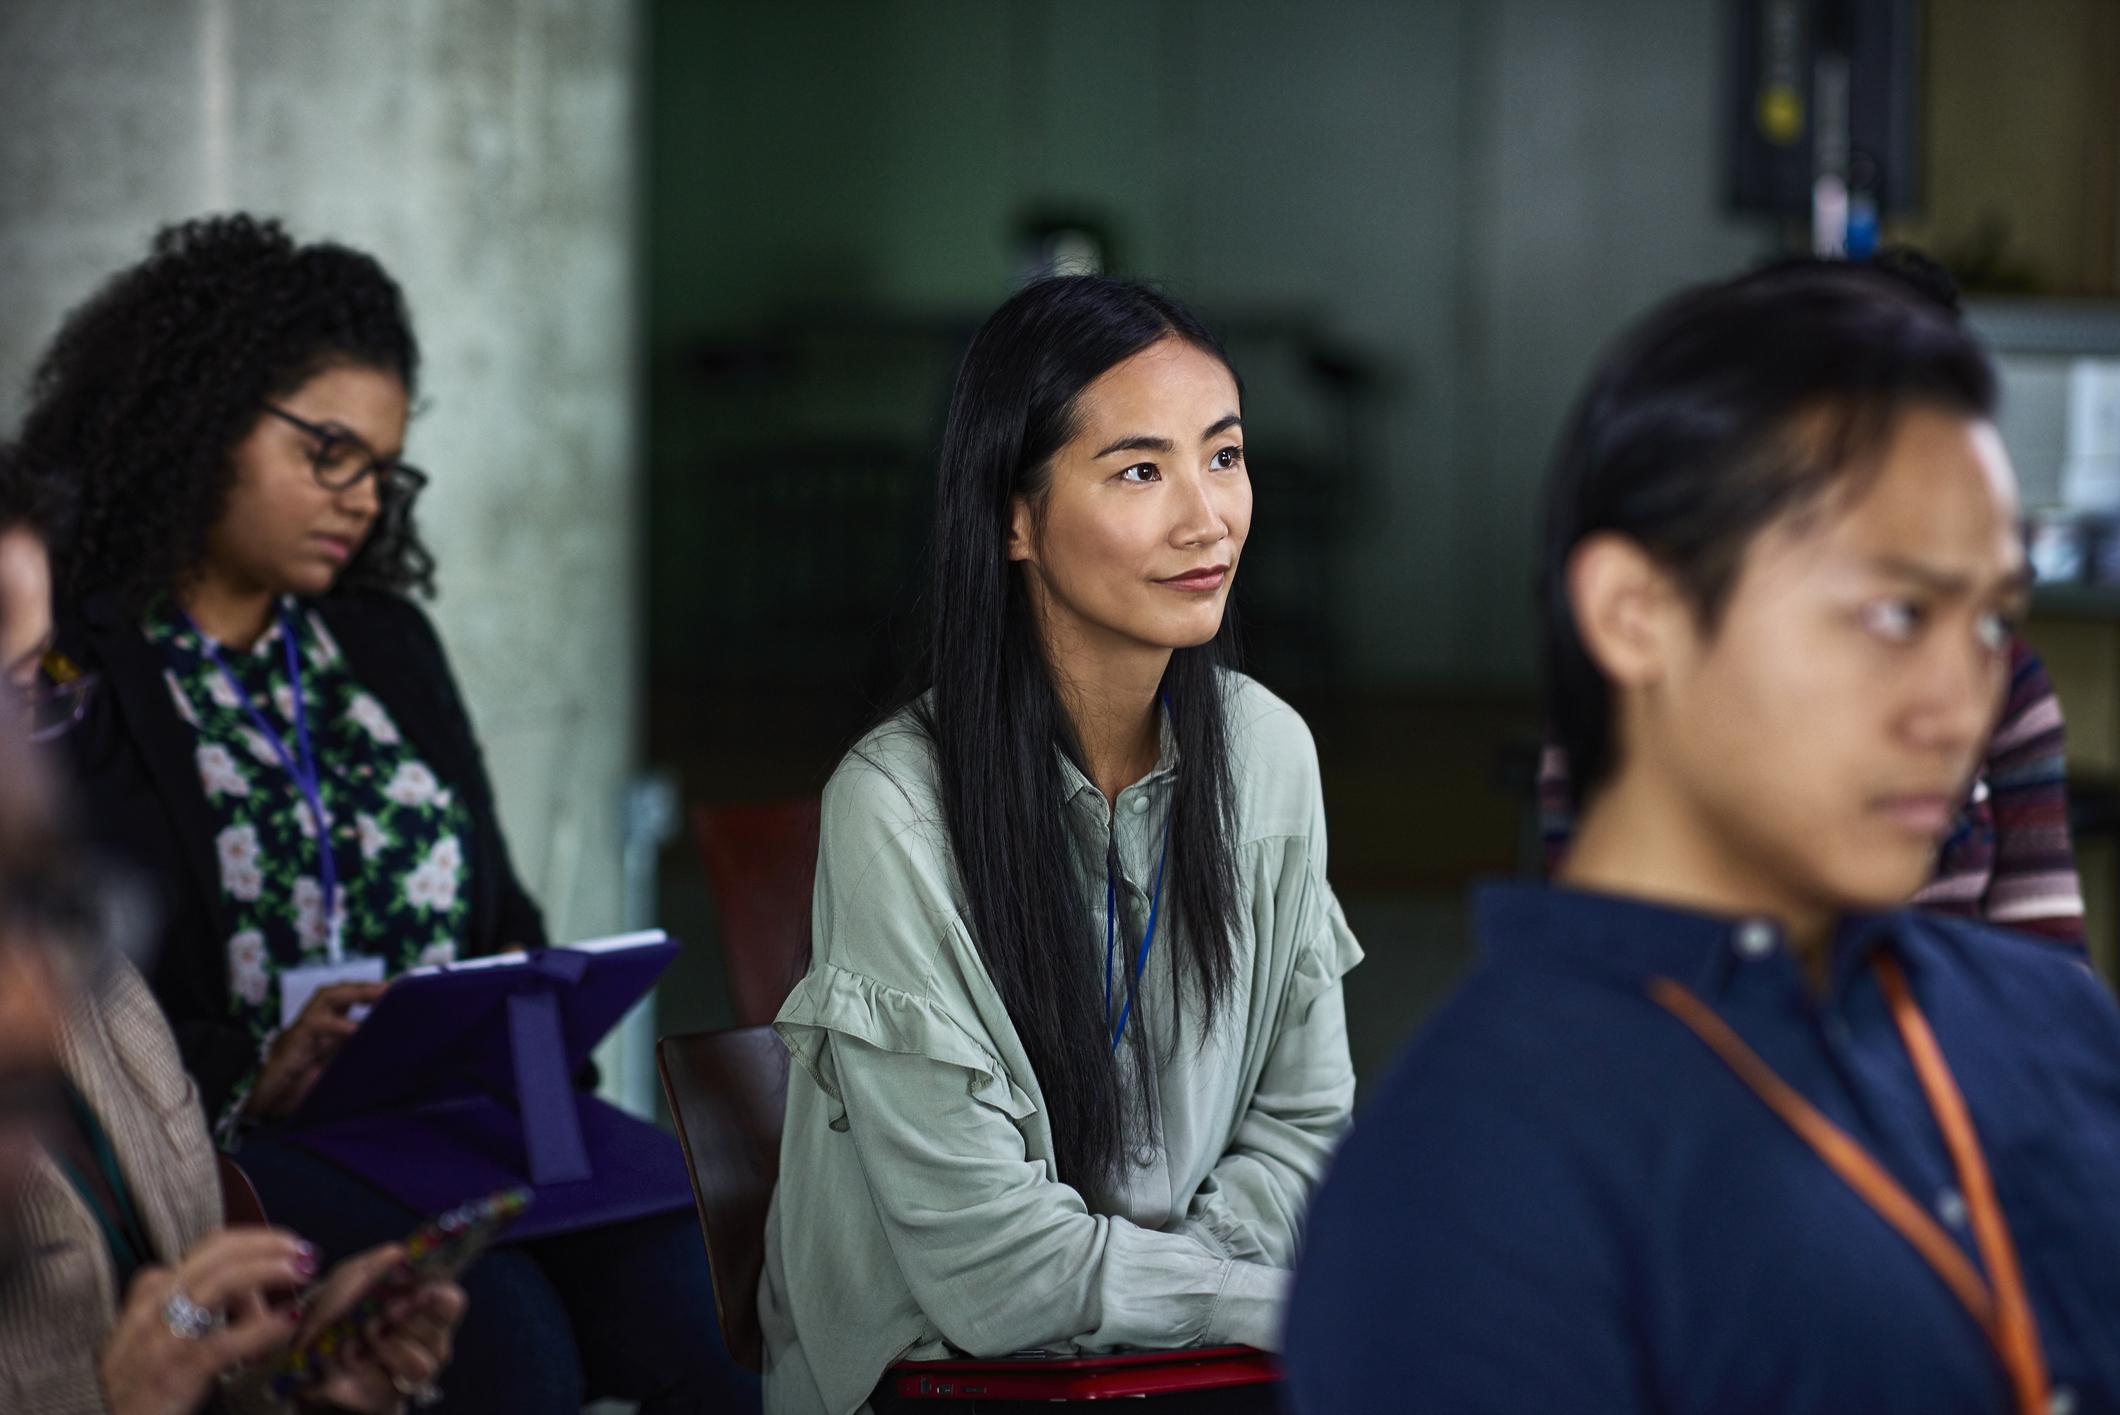 IALF merupakan salah satu lembaga bahasa Inggris yang menyediakan pelatihan dan tes IELTS - Edu2Review/Getty Images